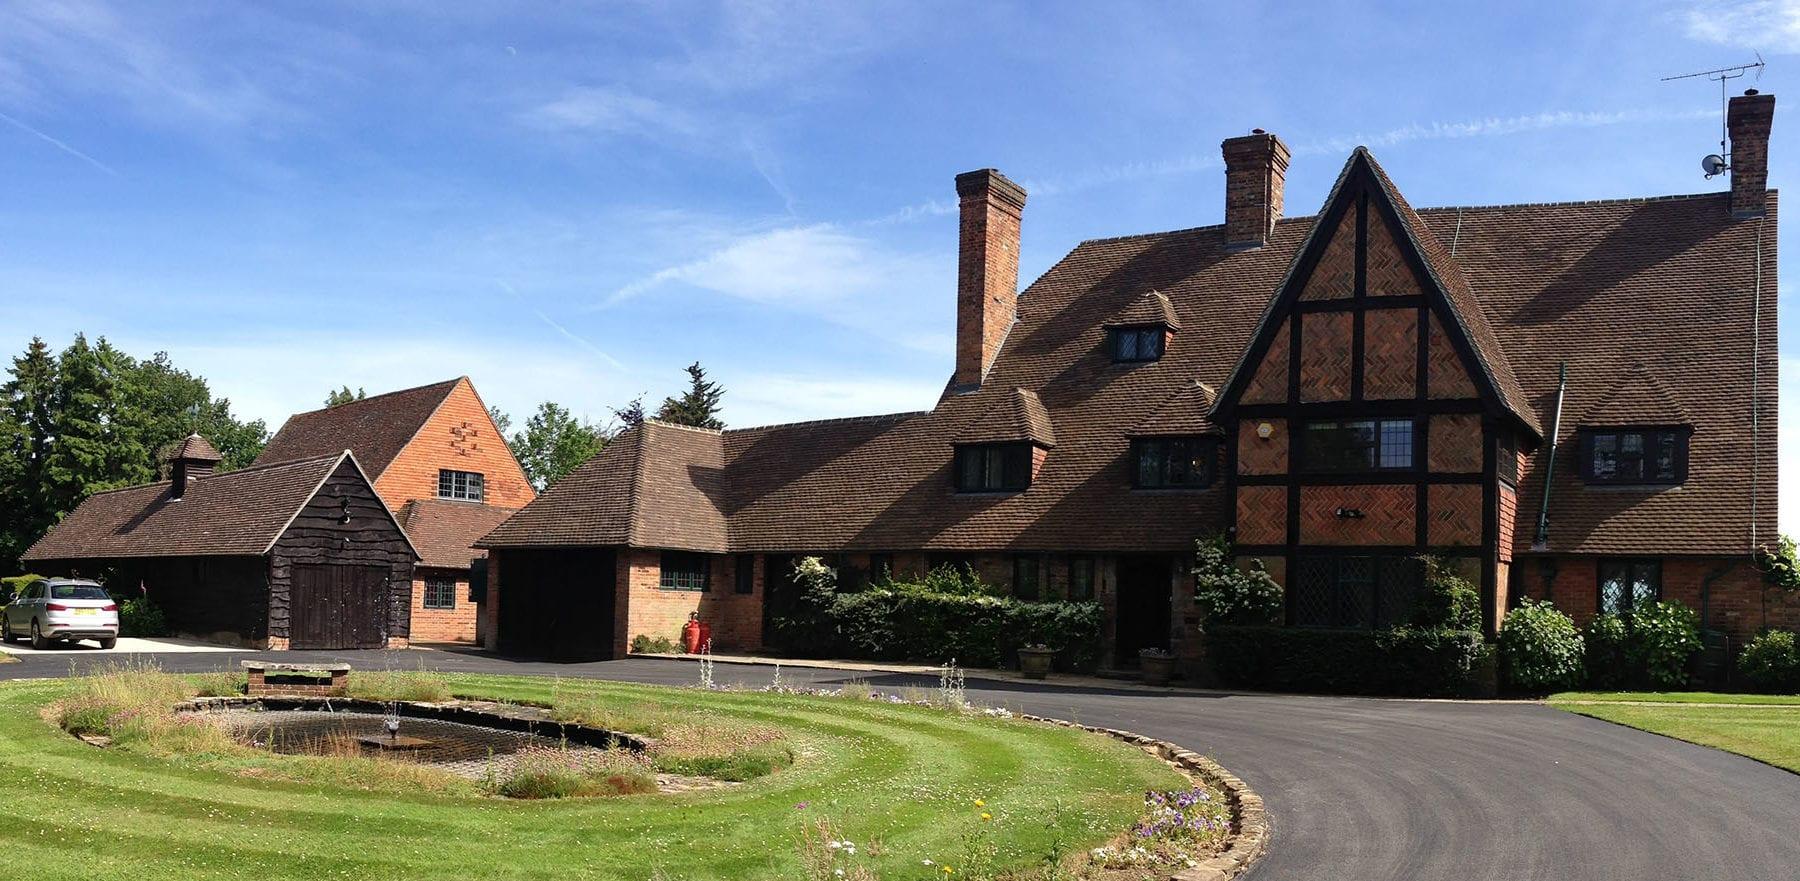 Lifestiles - Handmade Restoration Clay Roof Tiles - Poisenesters, England 2